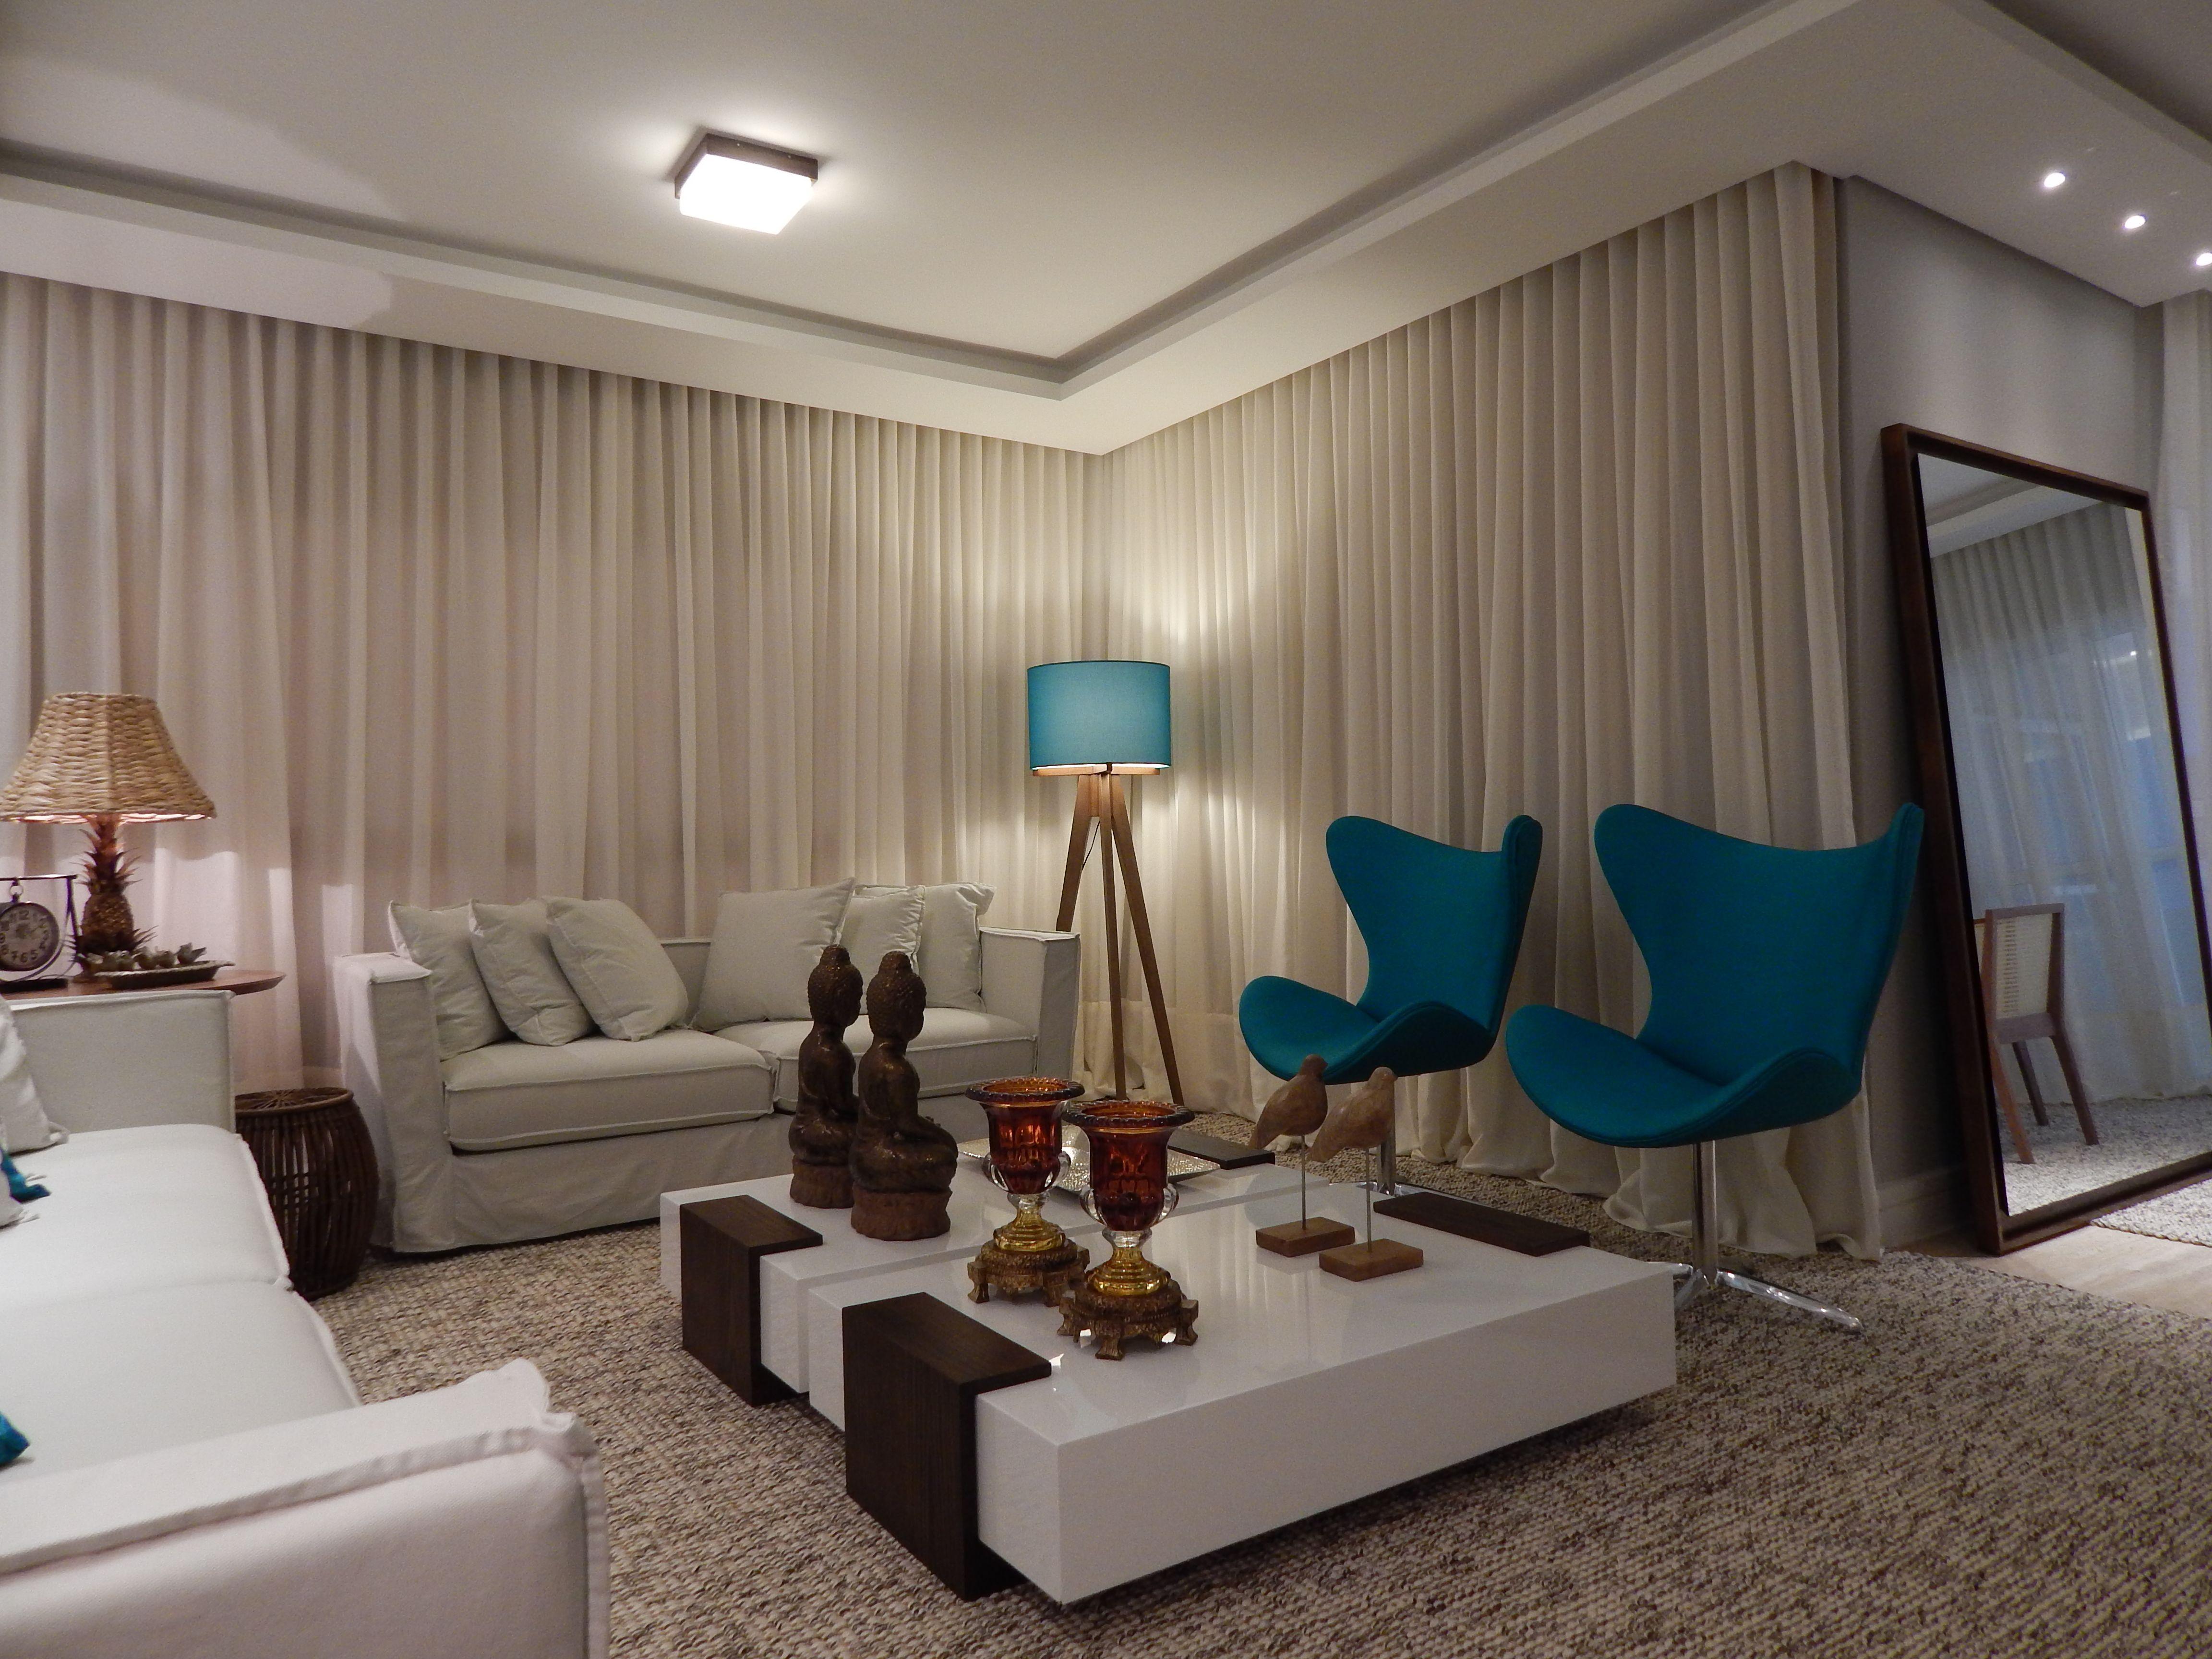 Sala de estar 2014 arquiteta barbara panassi azul - Cortinas turquesa ...